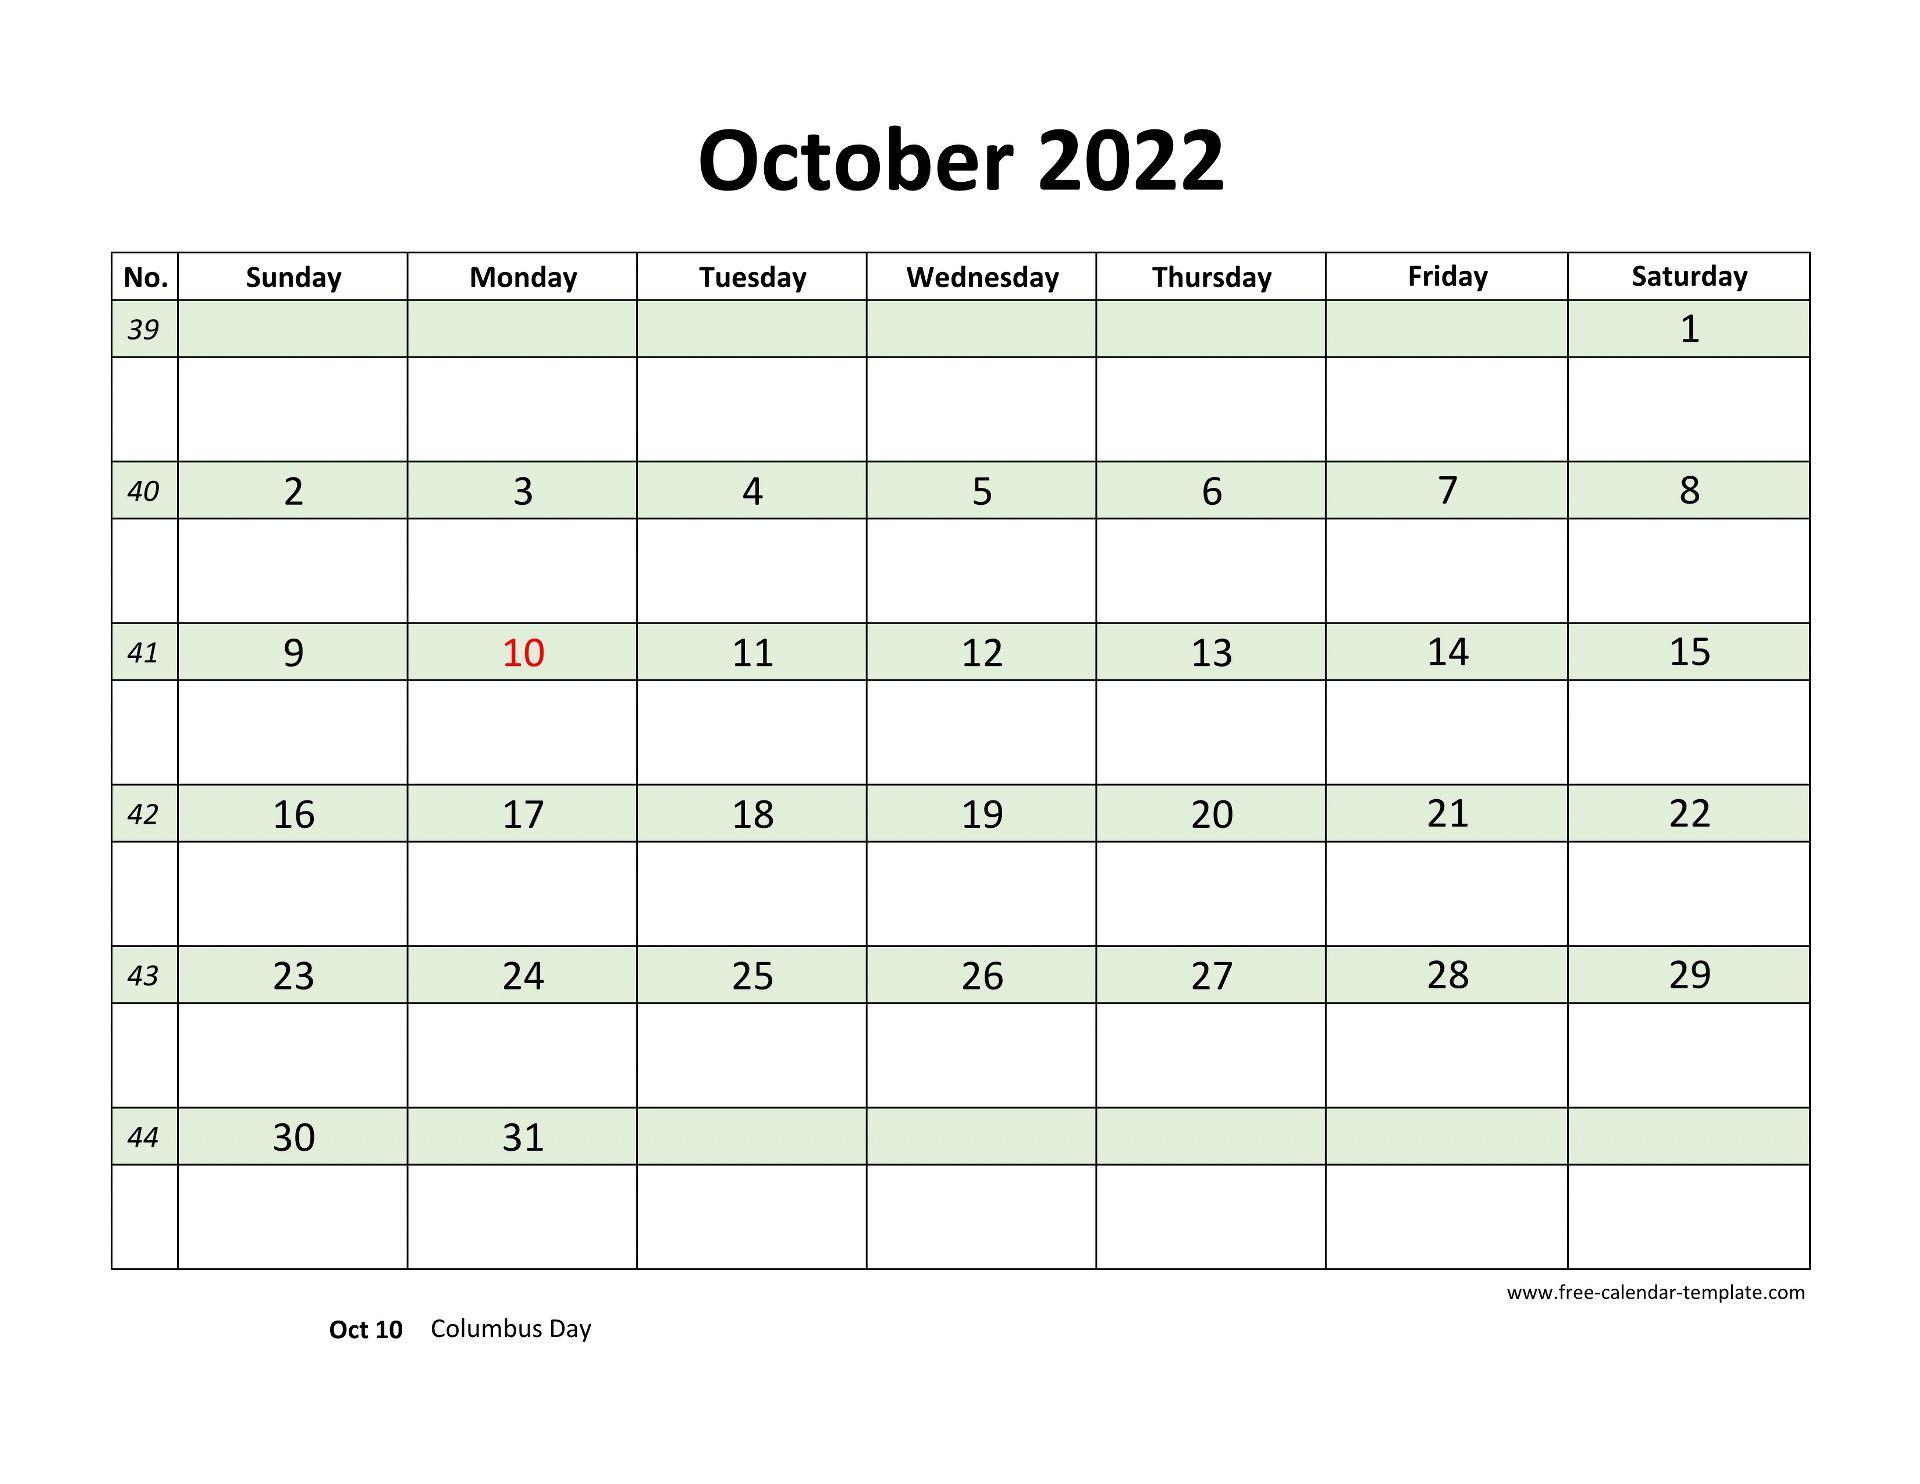 September October 2022 Calendar.Free October 2022 Calendar Coloring On Each Day Horizontal Free Calendar Template Com